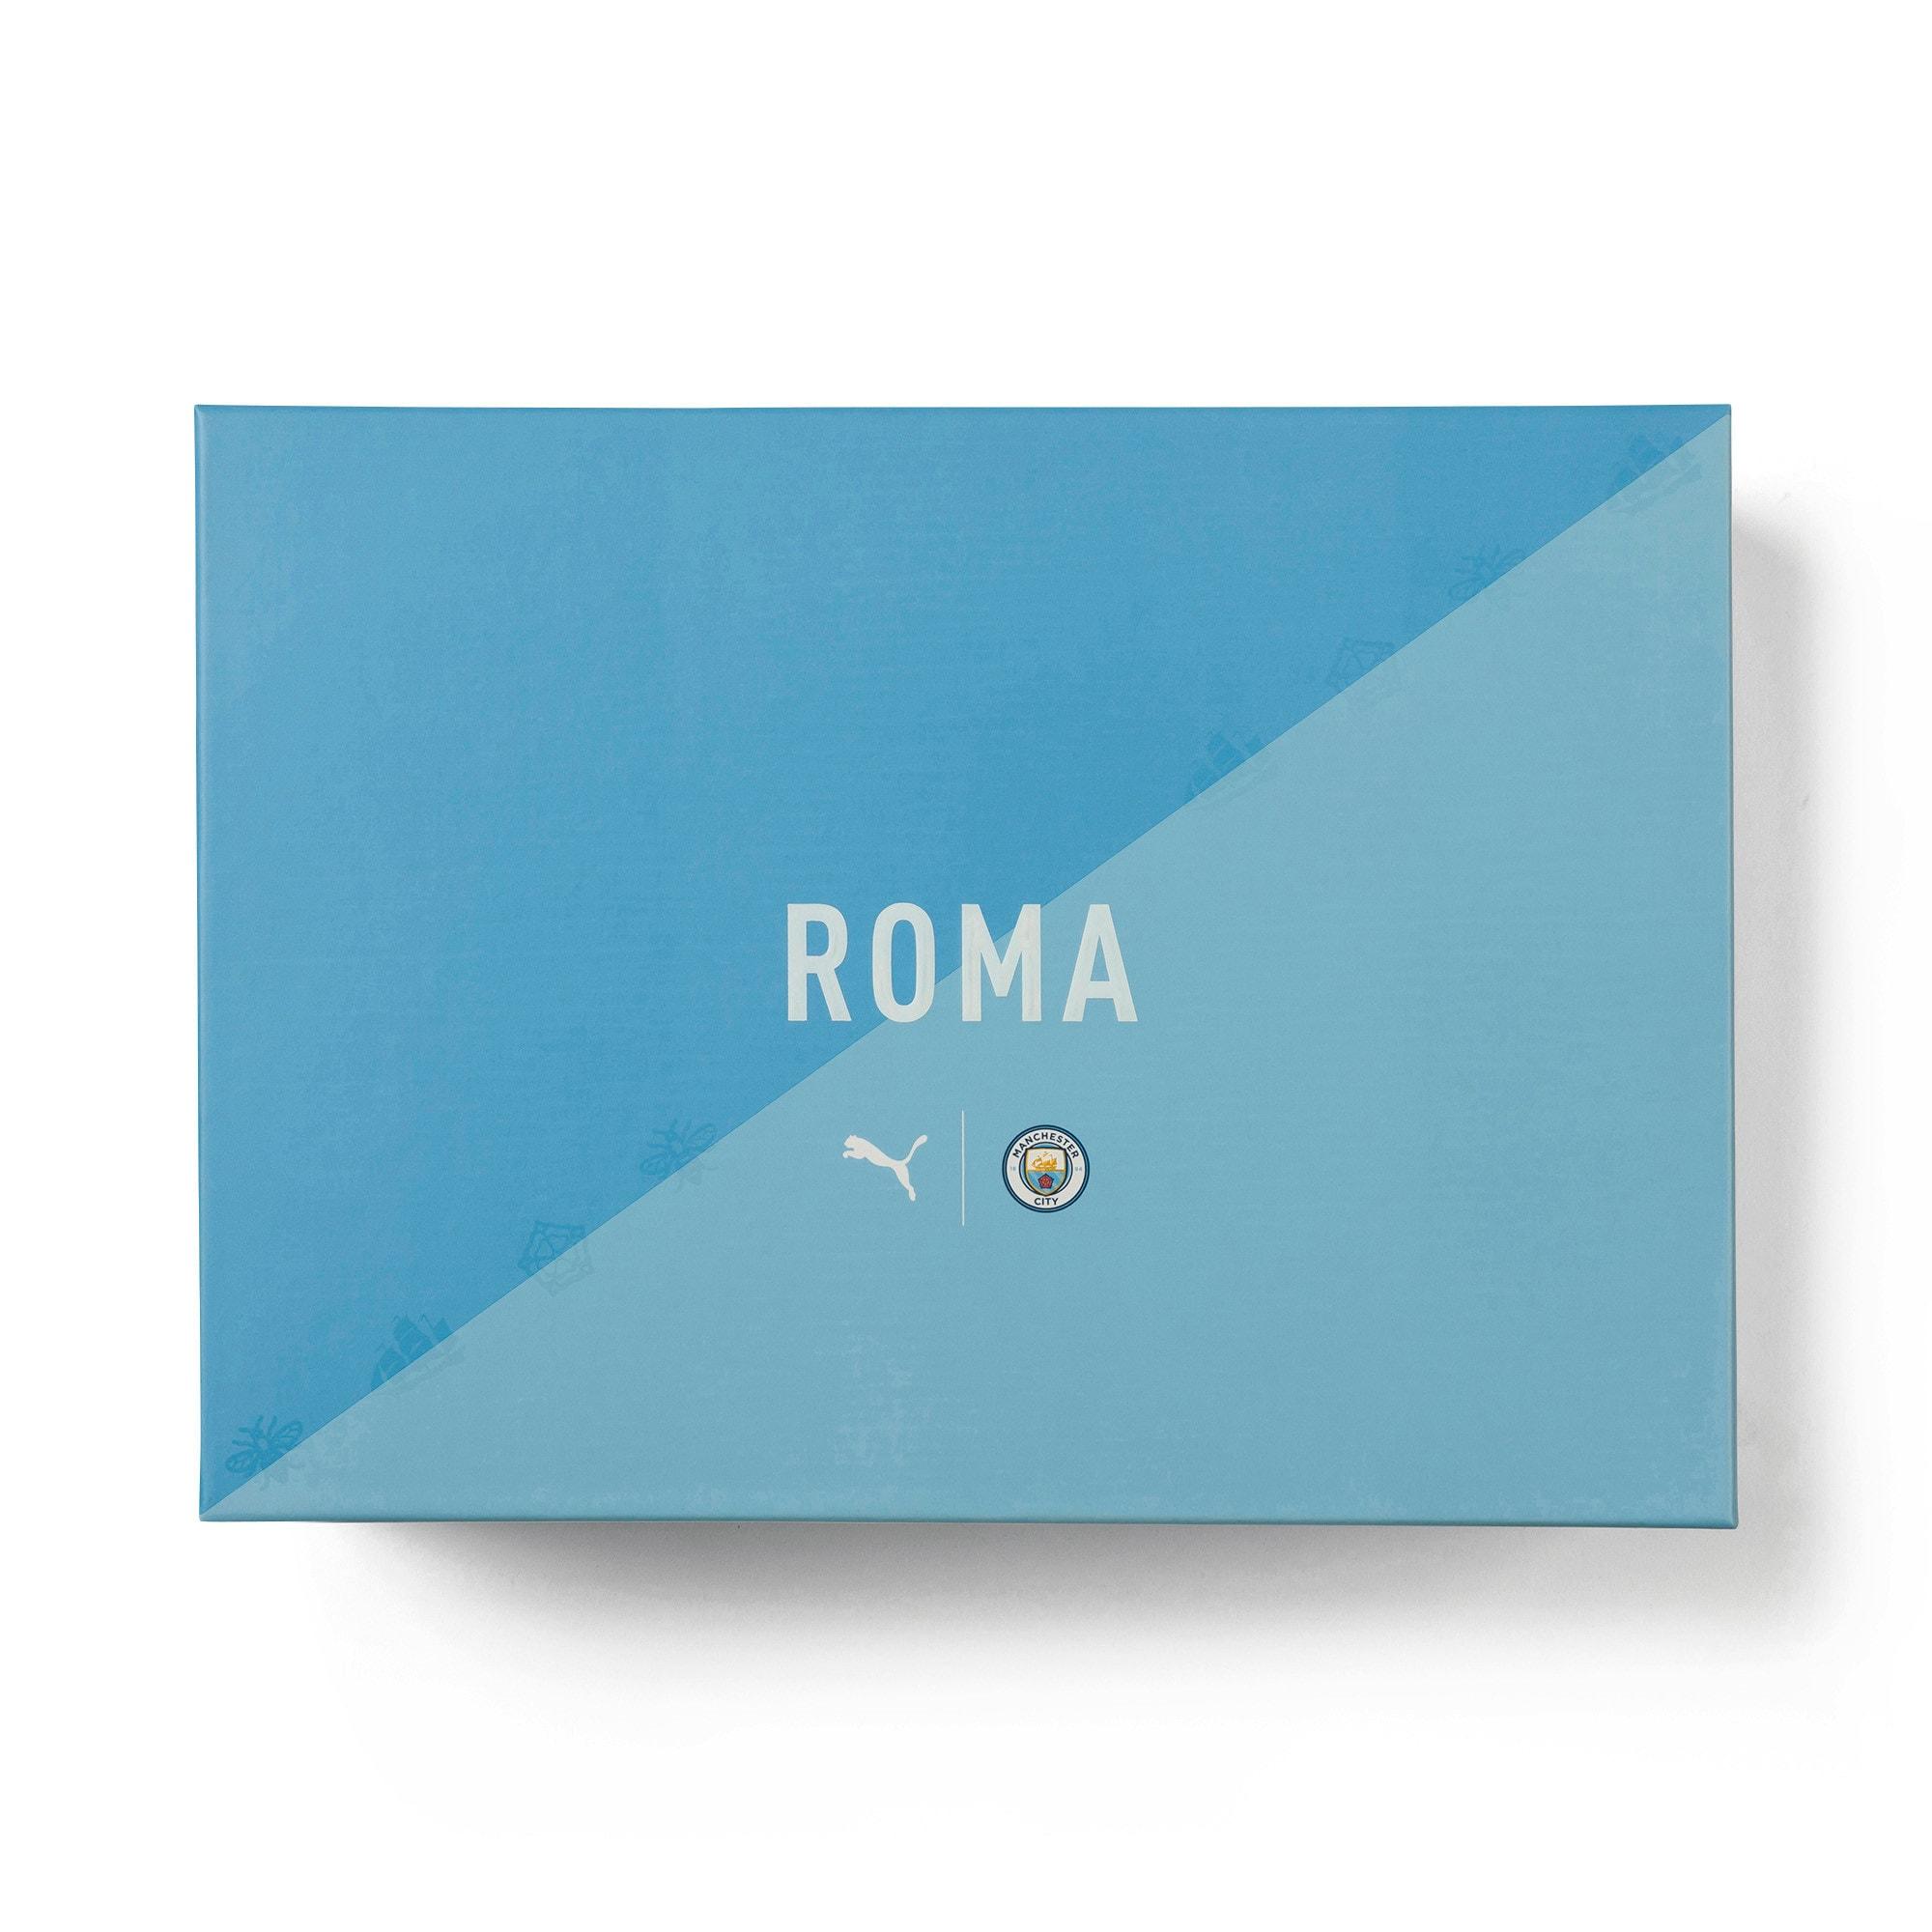 Thumbnail 7 of Roma Manchester City Men's Sneakers, Gray Violet-Team Light Blue, medium